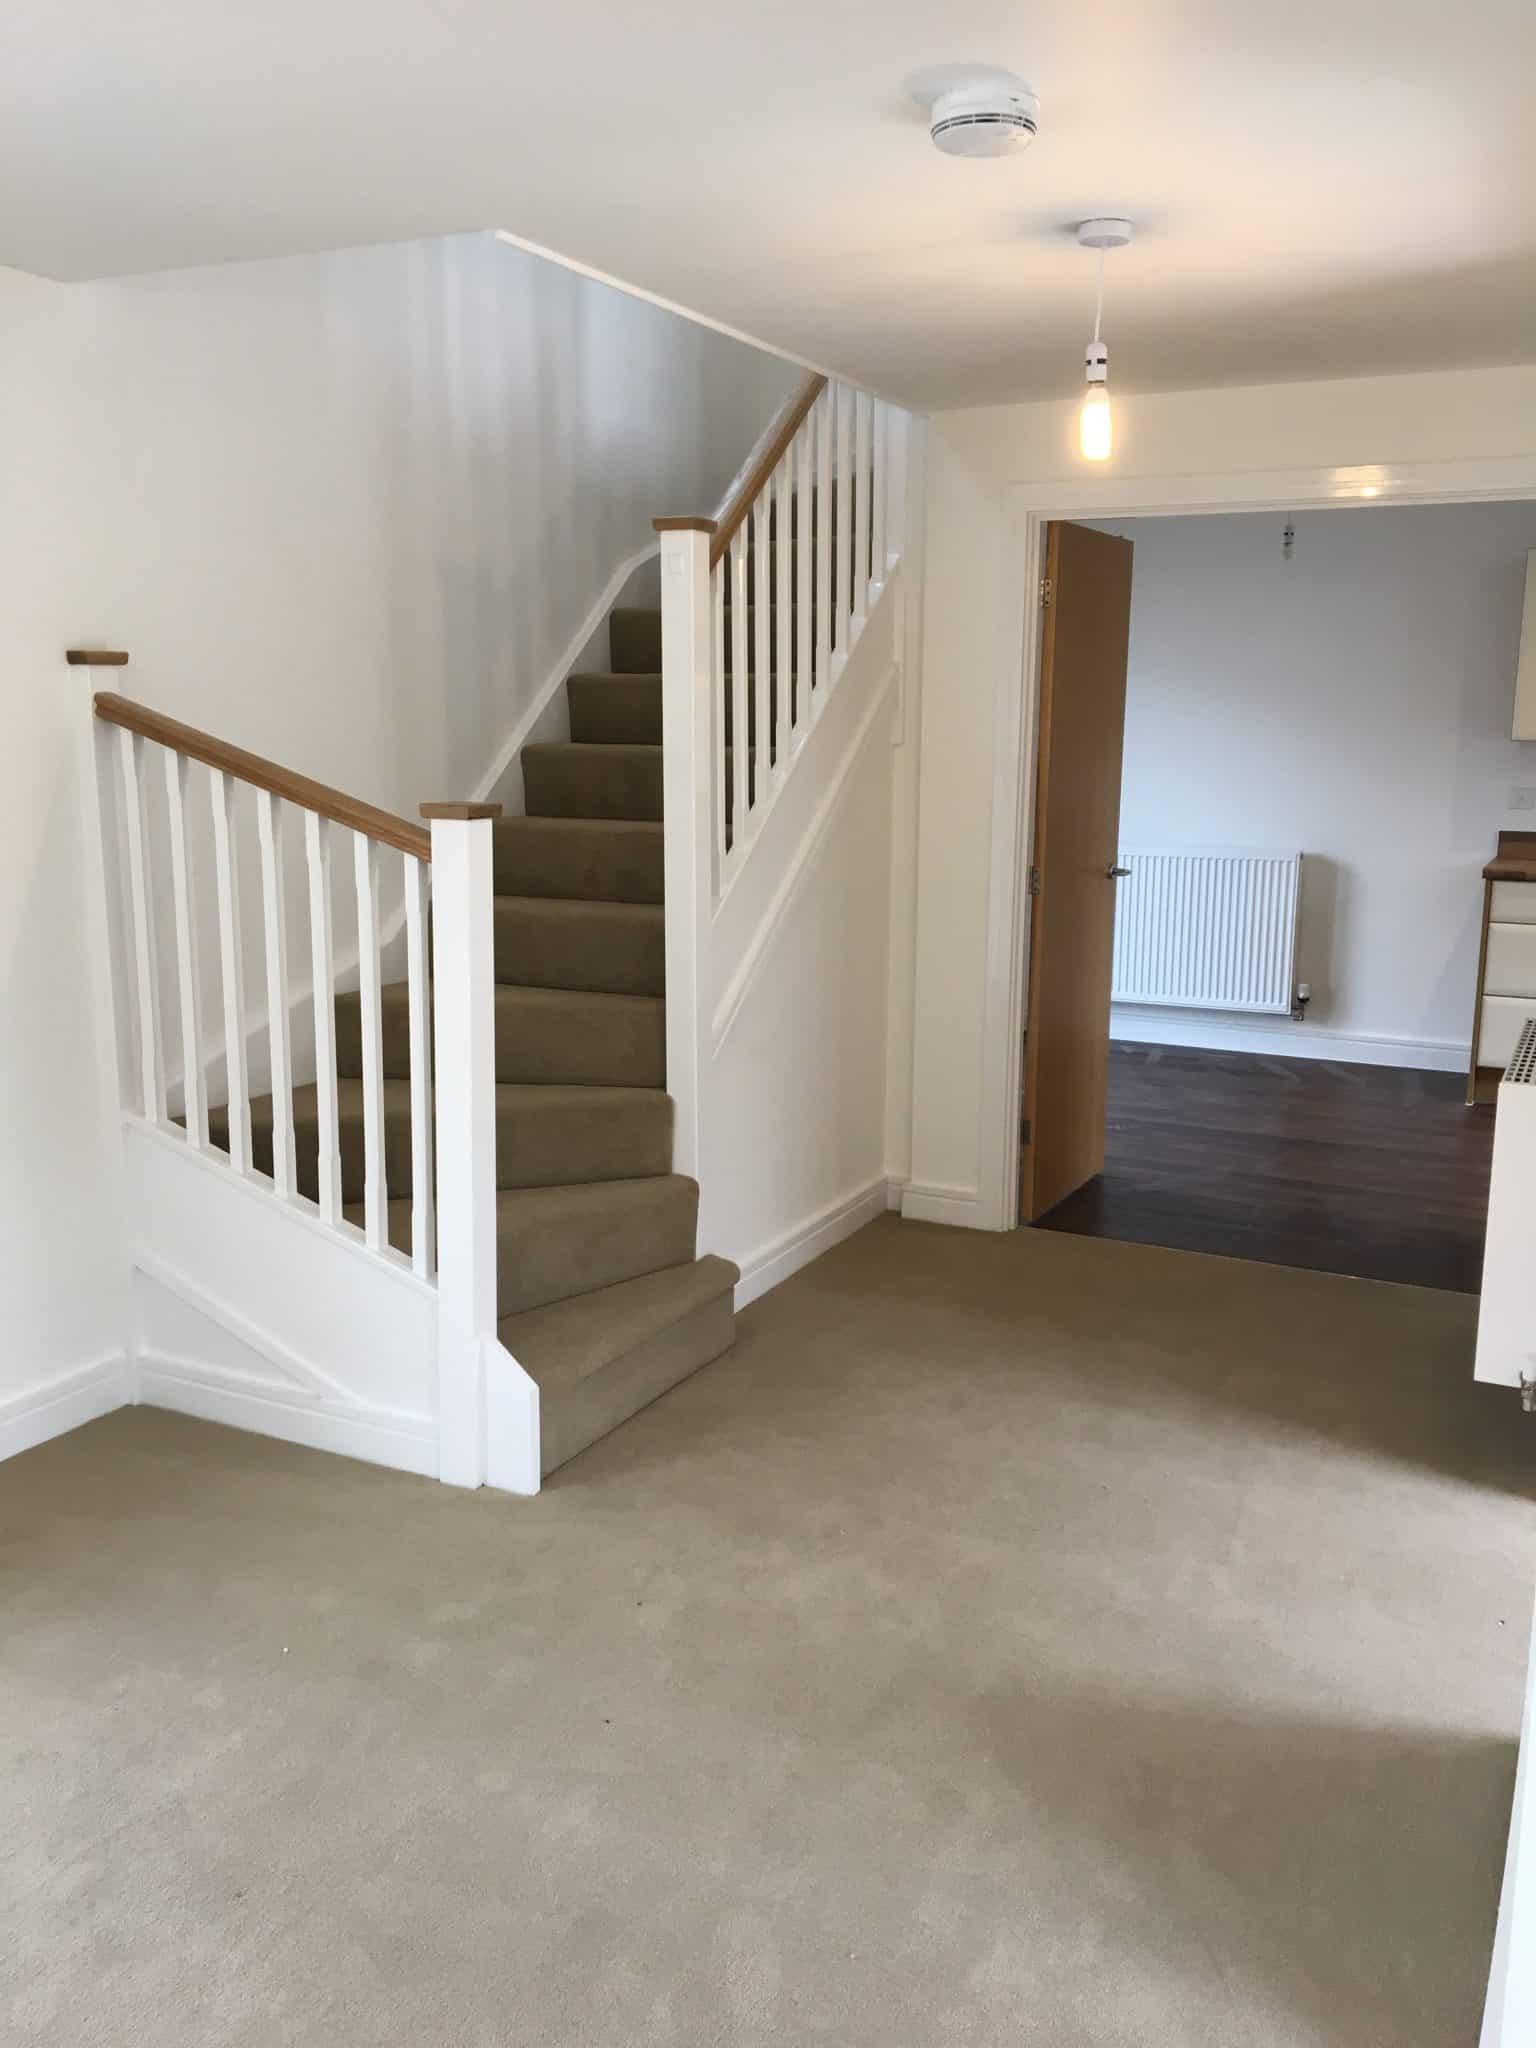 blank hallway ready for decorating